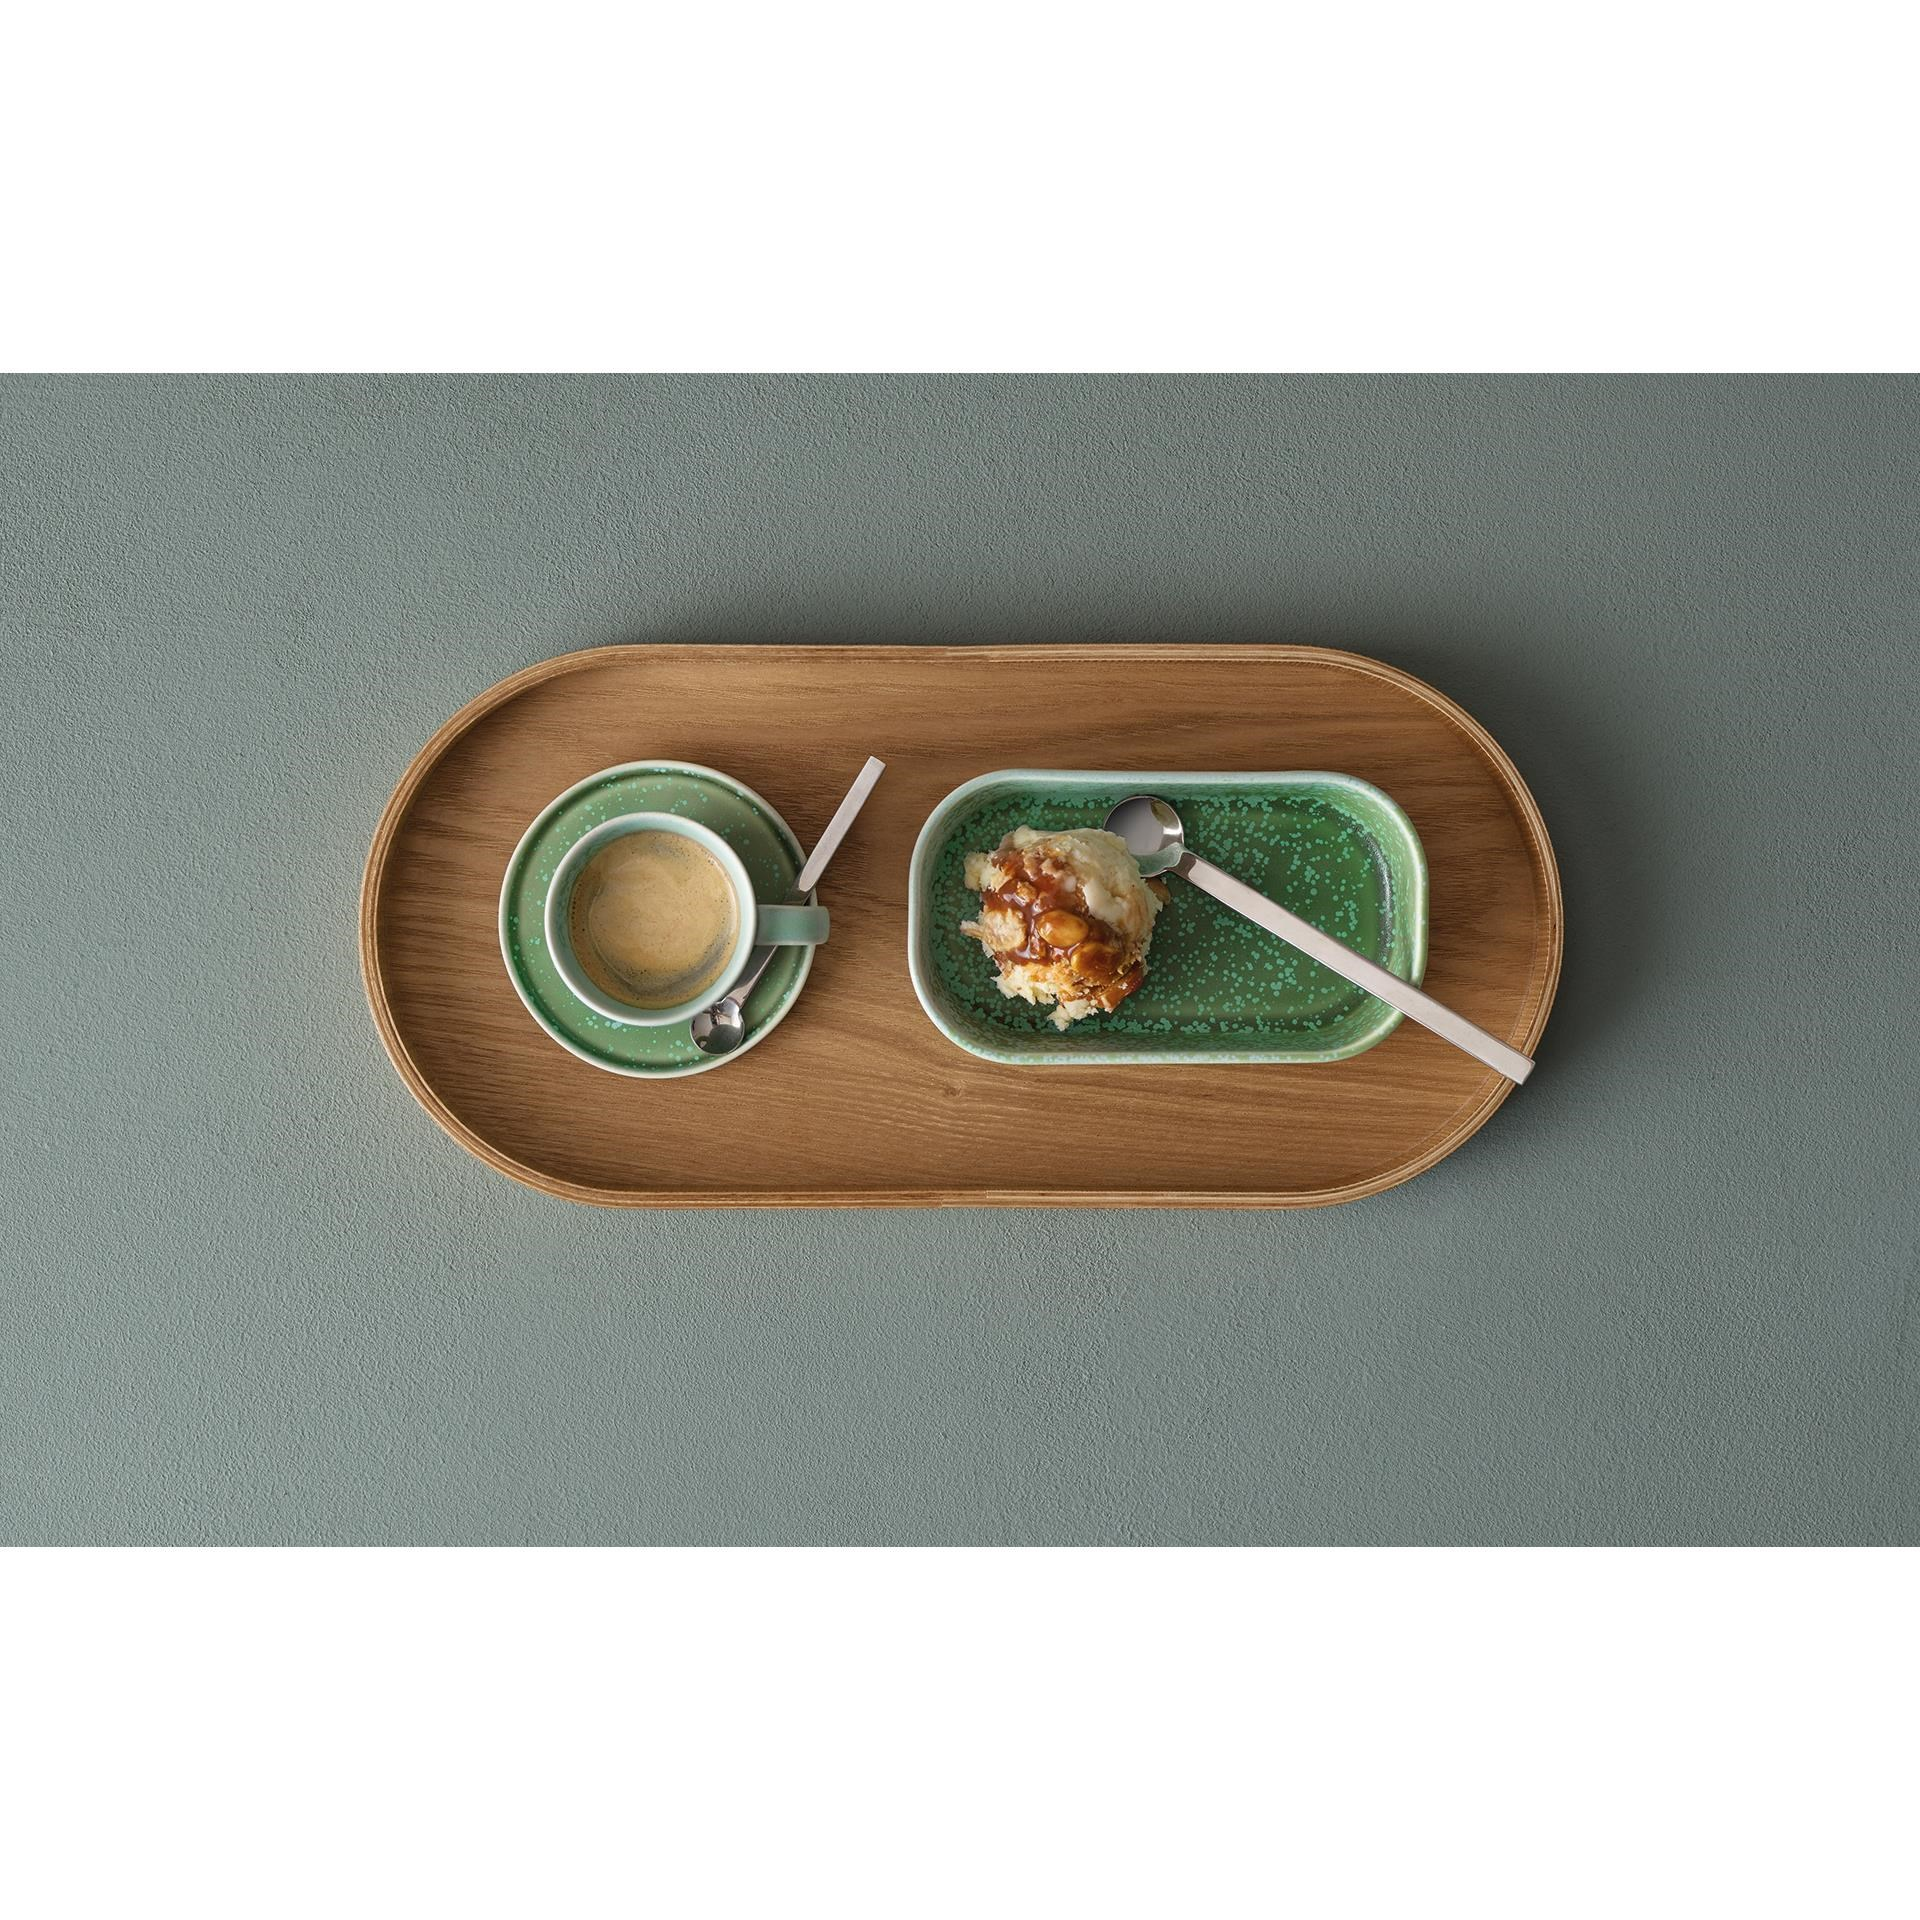 Dřevěný tác SONOKO oválný 35,5x16,5 cm_2